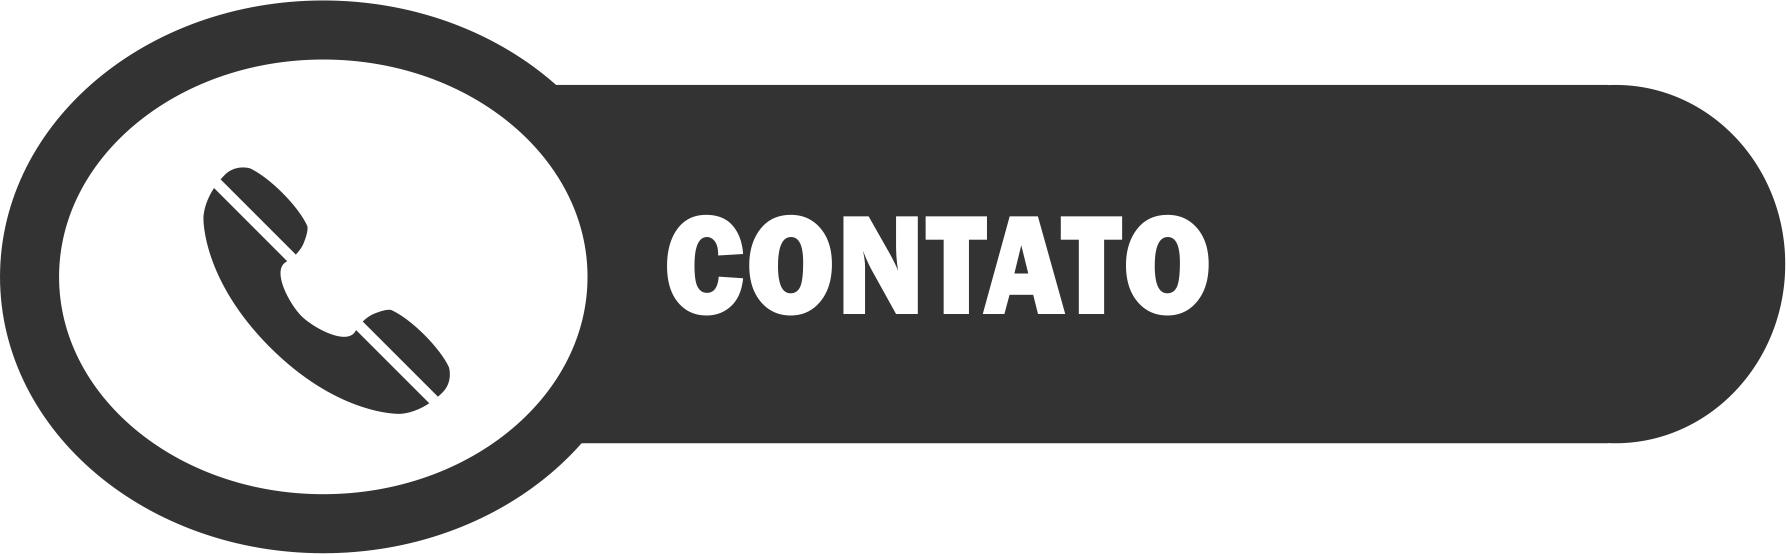 Link para contato